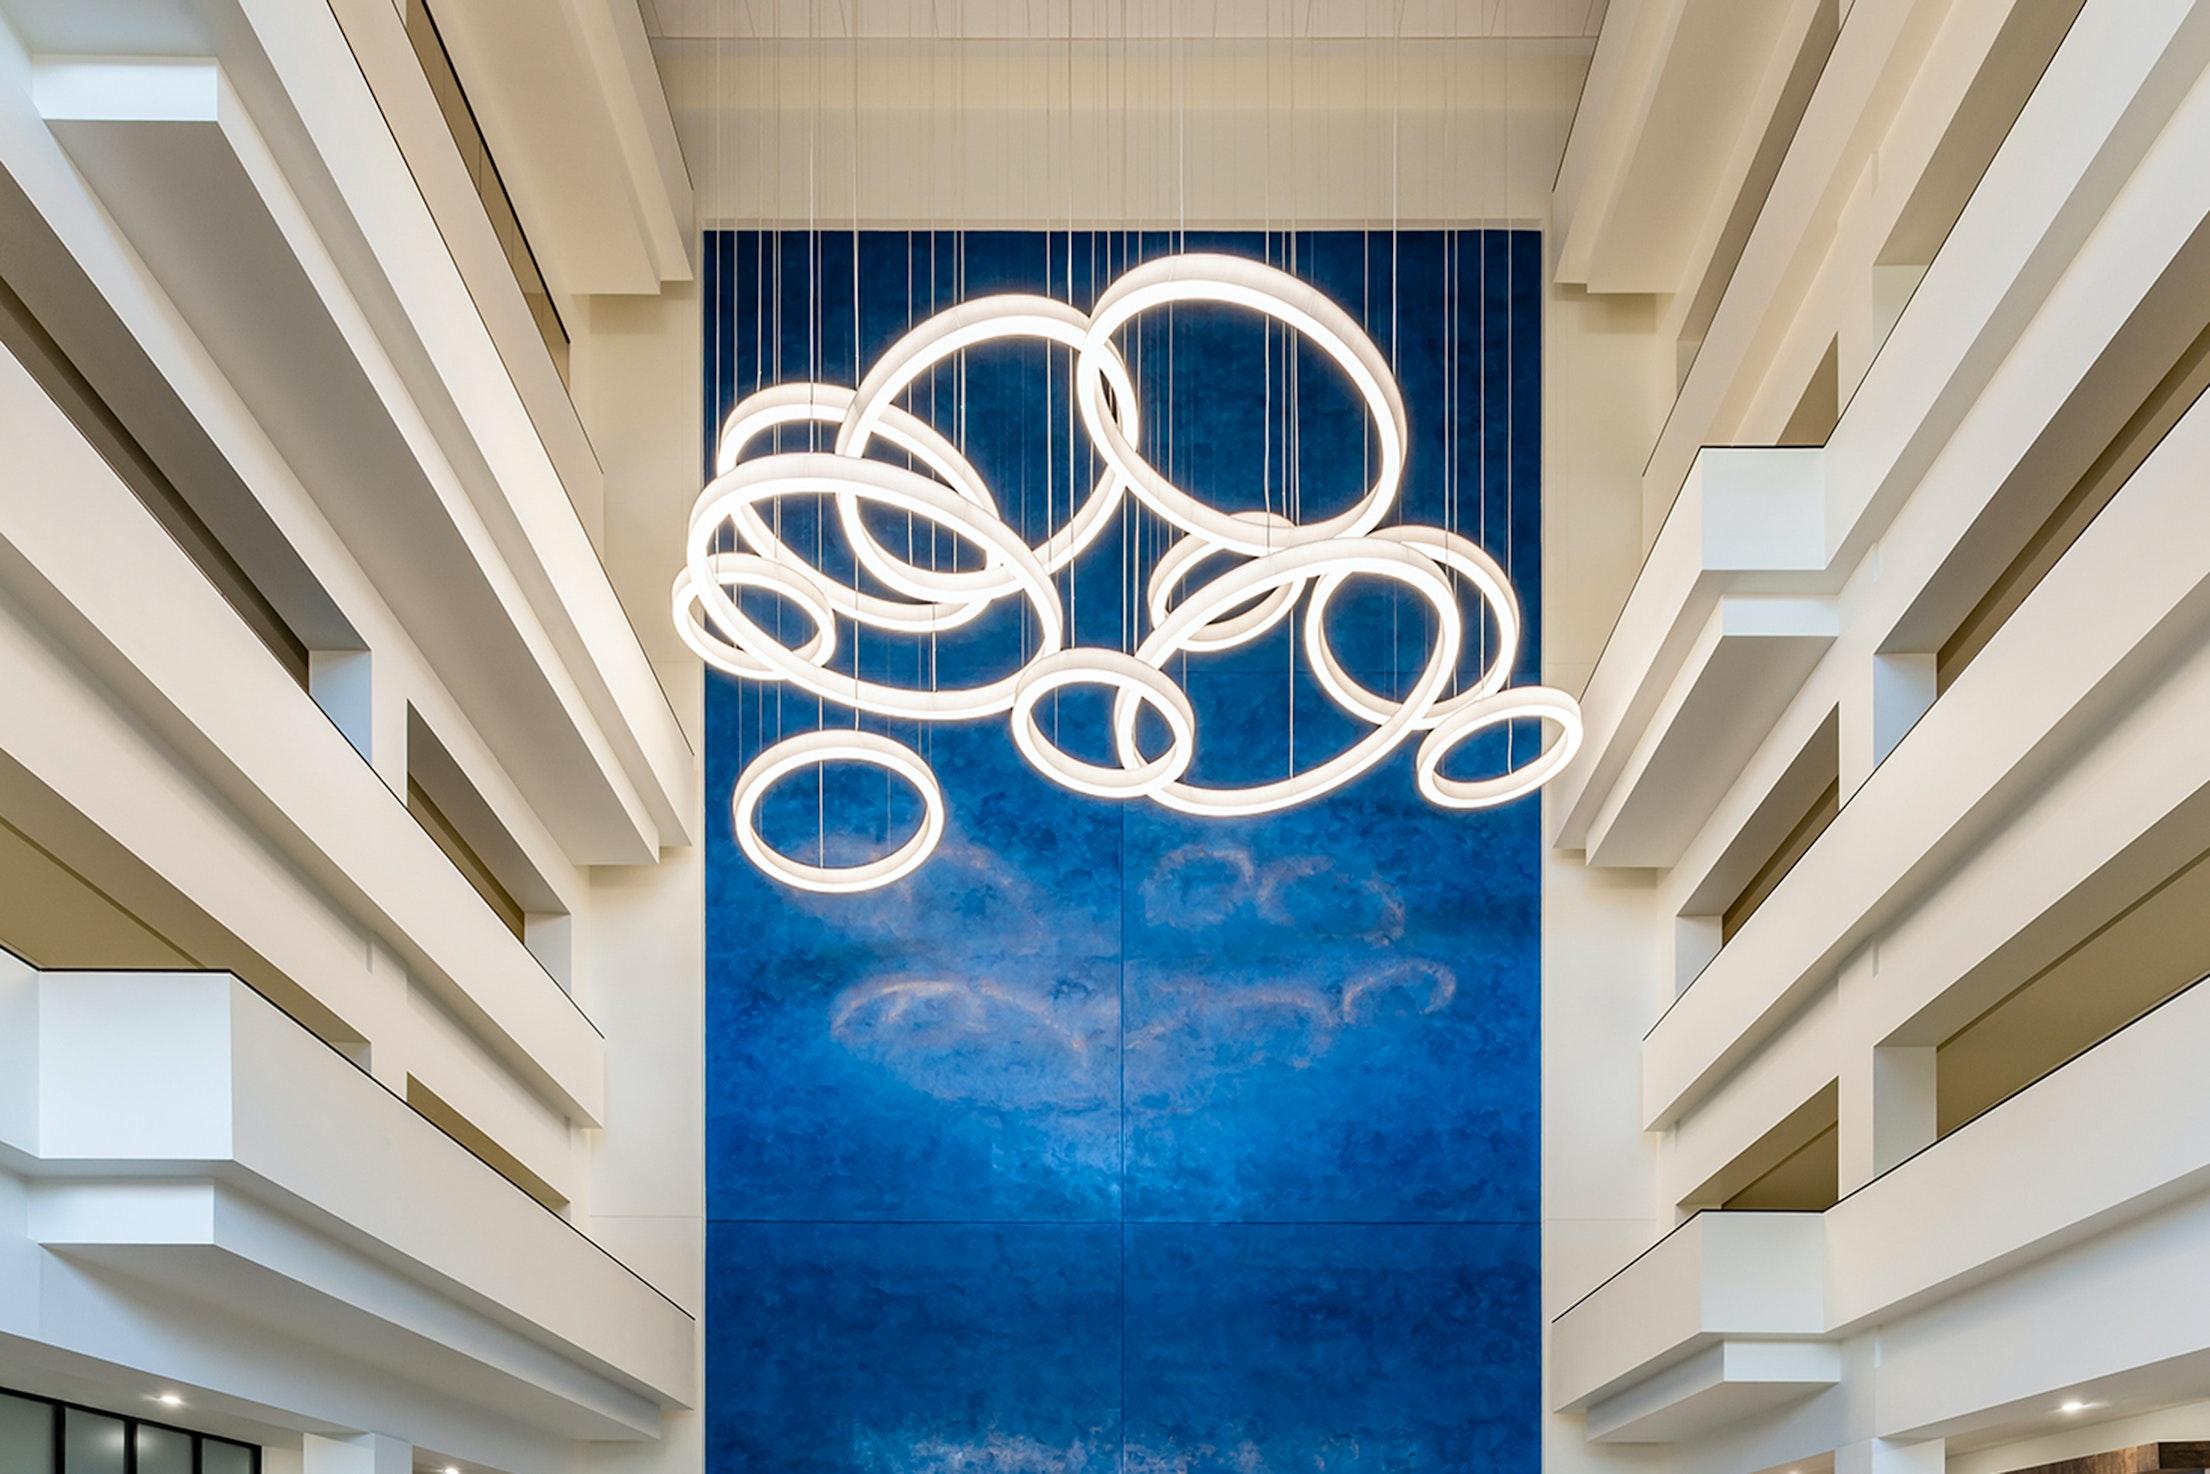 Lightart la2 rings Park Central web 4 cropped